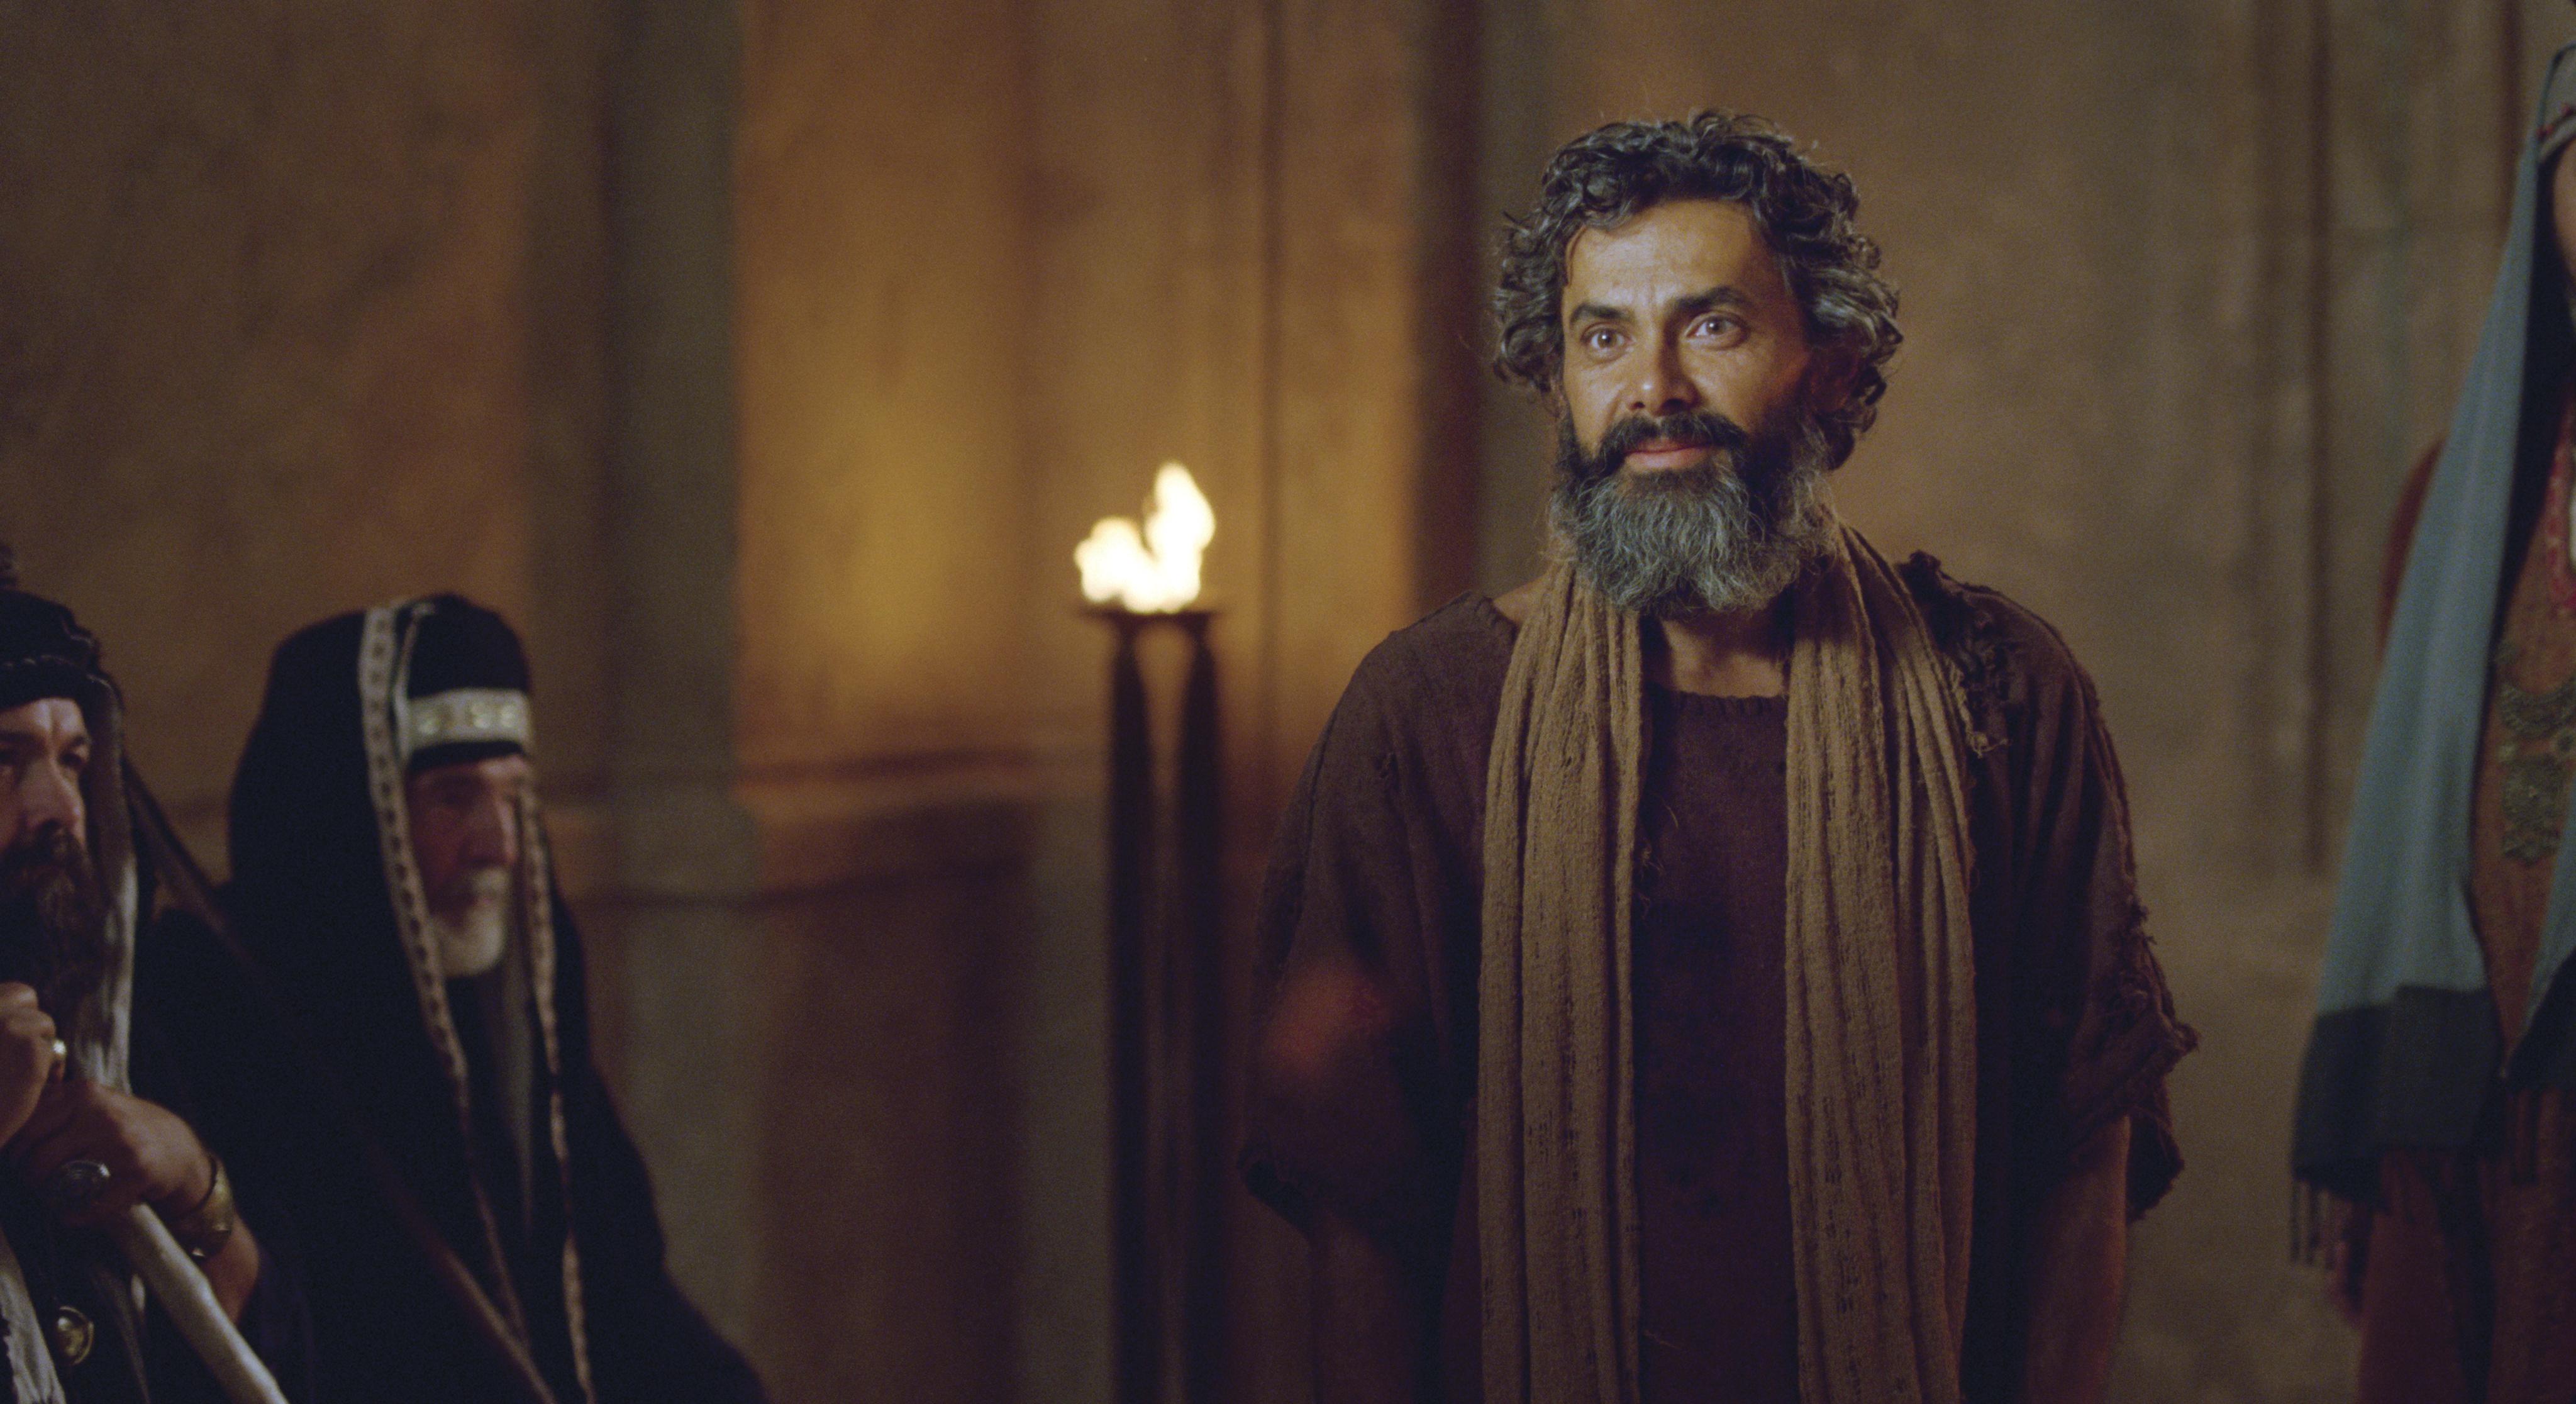 A man born blind tells the Pharisees of Christ's healing power.